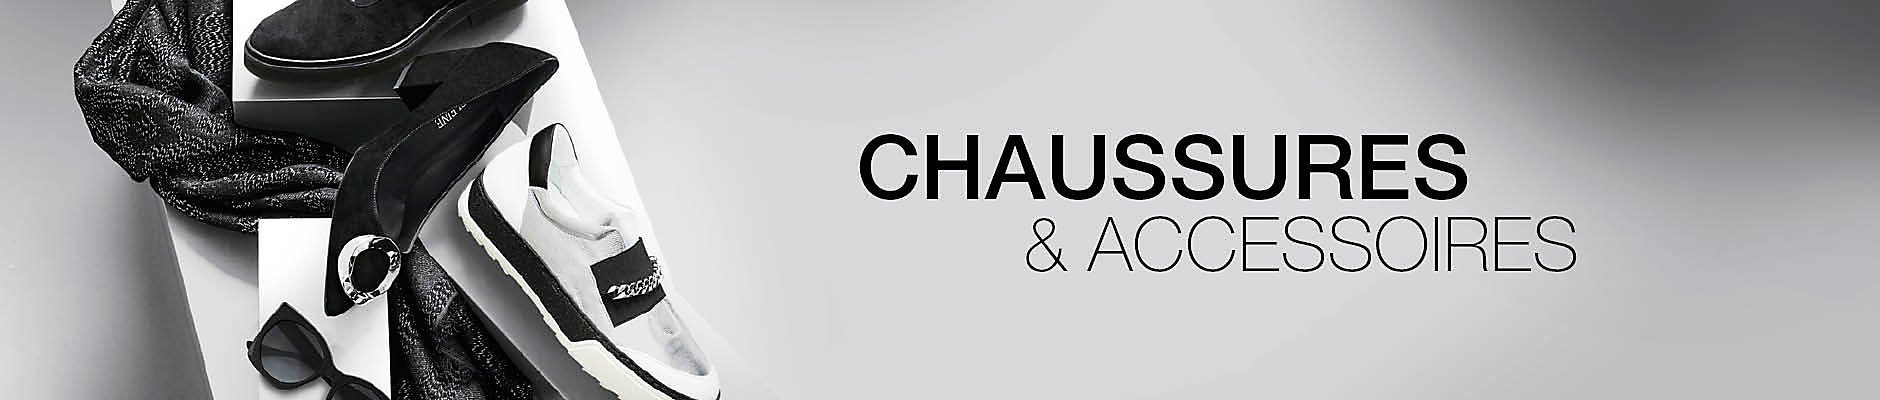 Chaussures & Accessoires